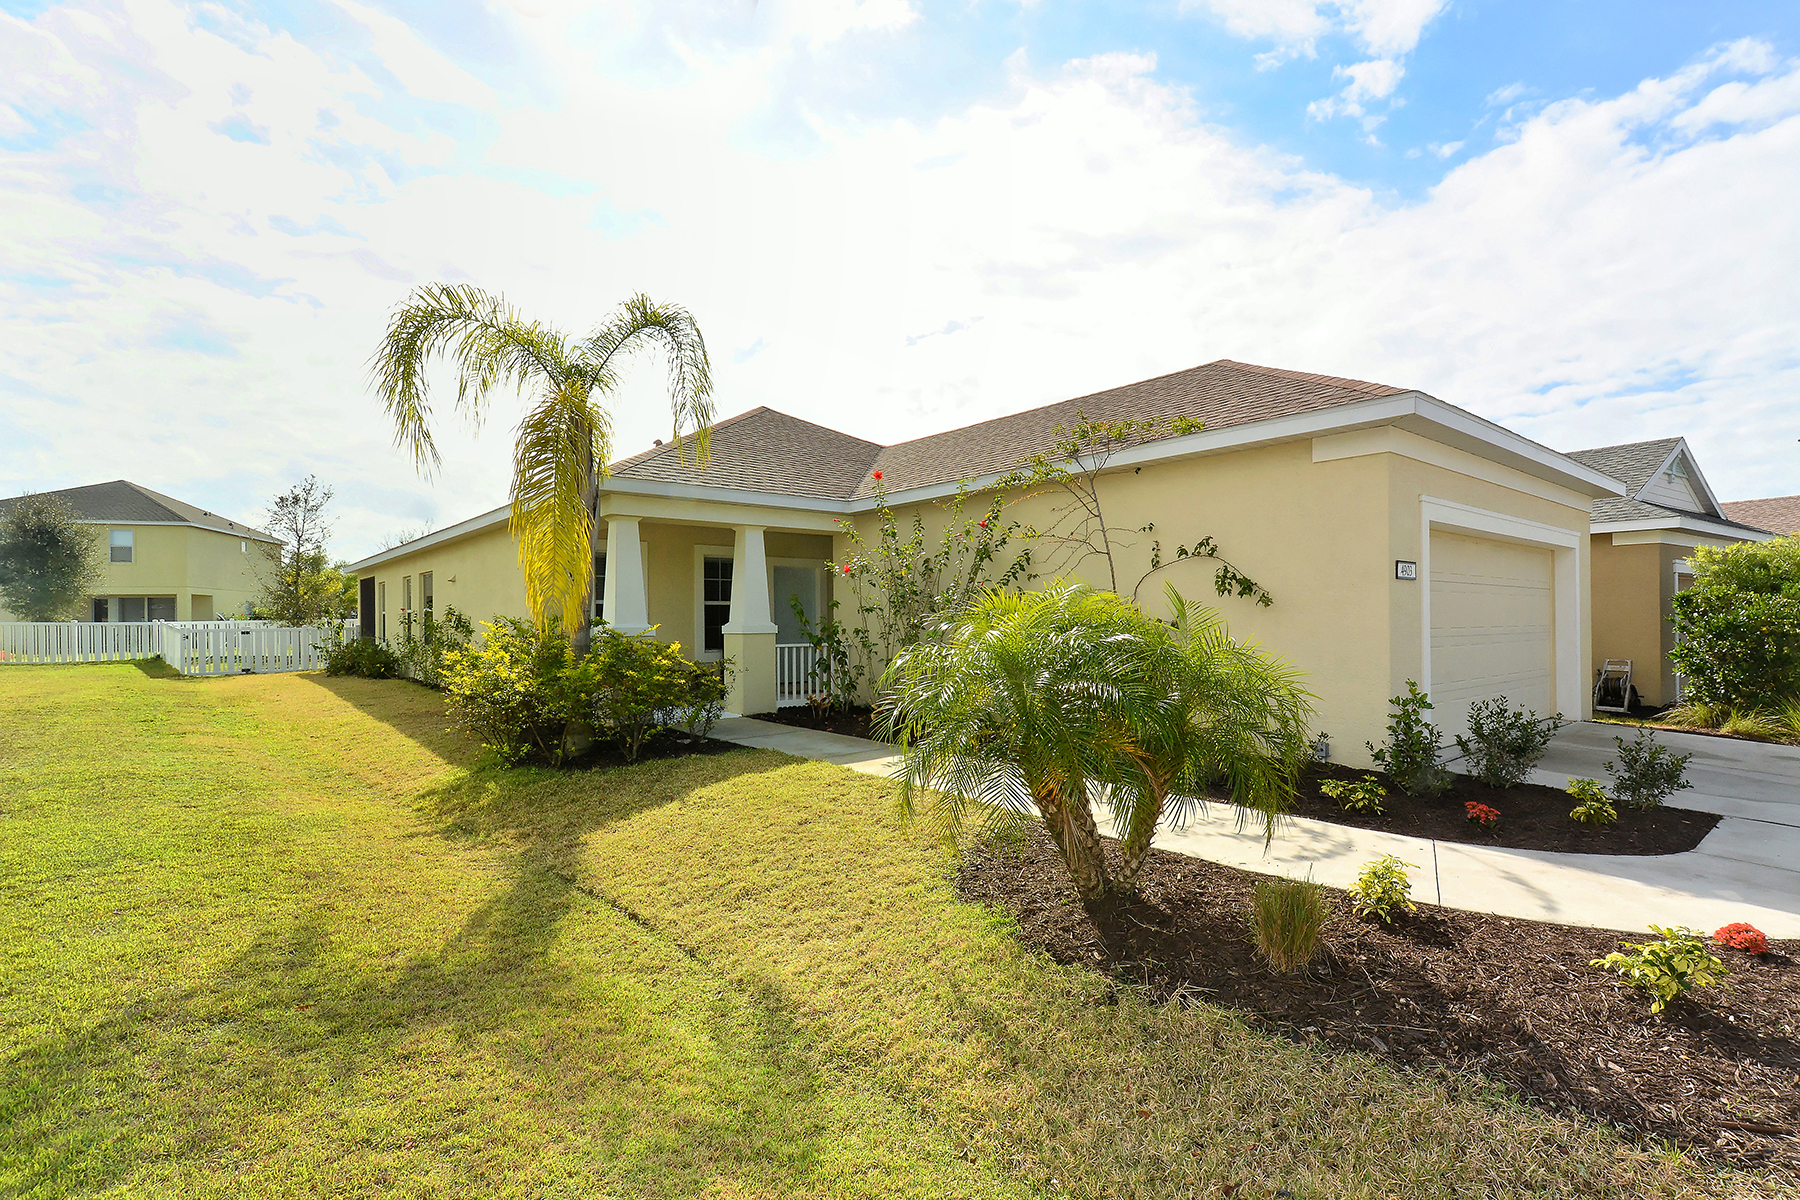 Single Family Home for Sale at CENTRAL PARK 4903 Boston Common Bradenton, Florida, 34211 United States